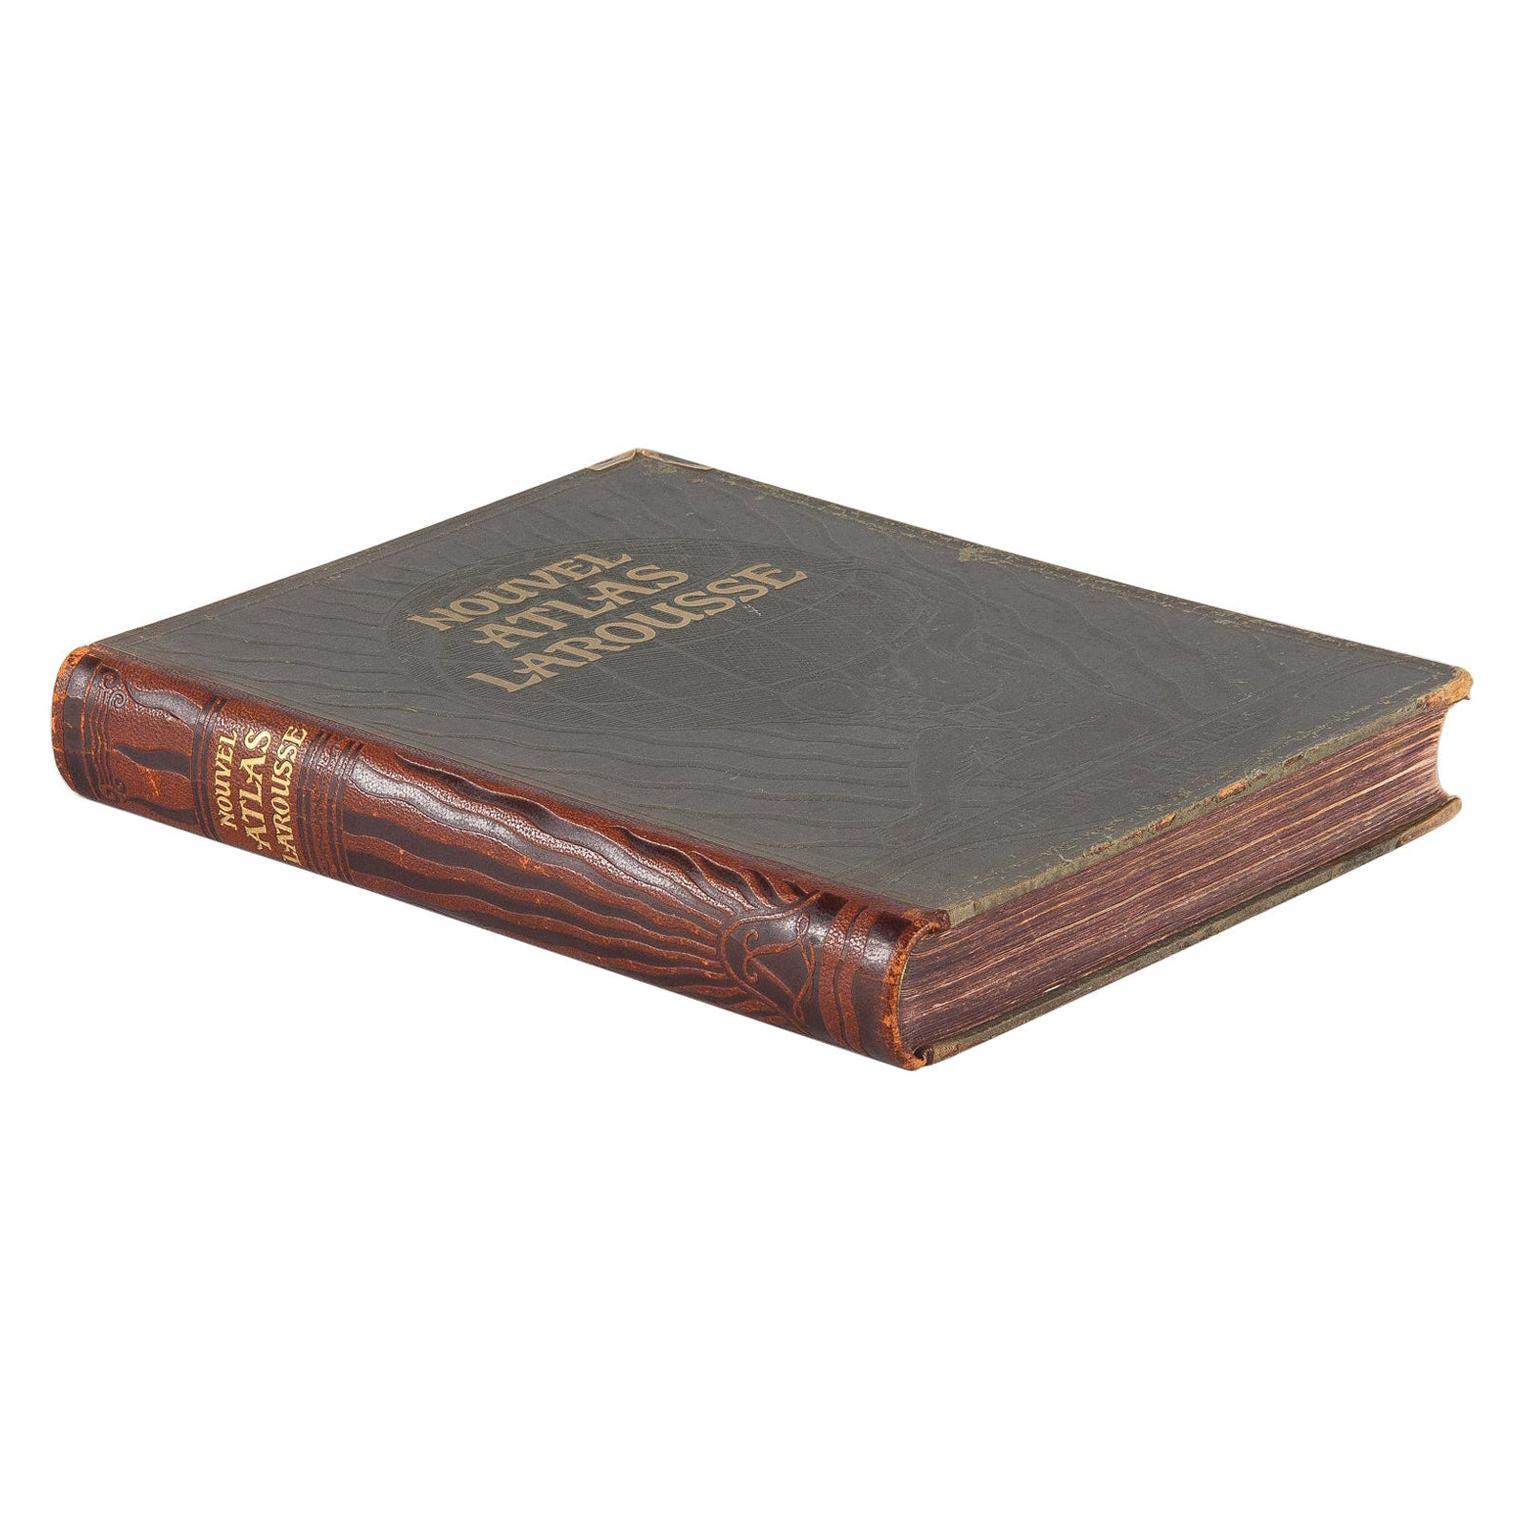 French Book Nouvel Atlas Larousse, 1924